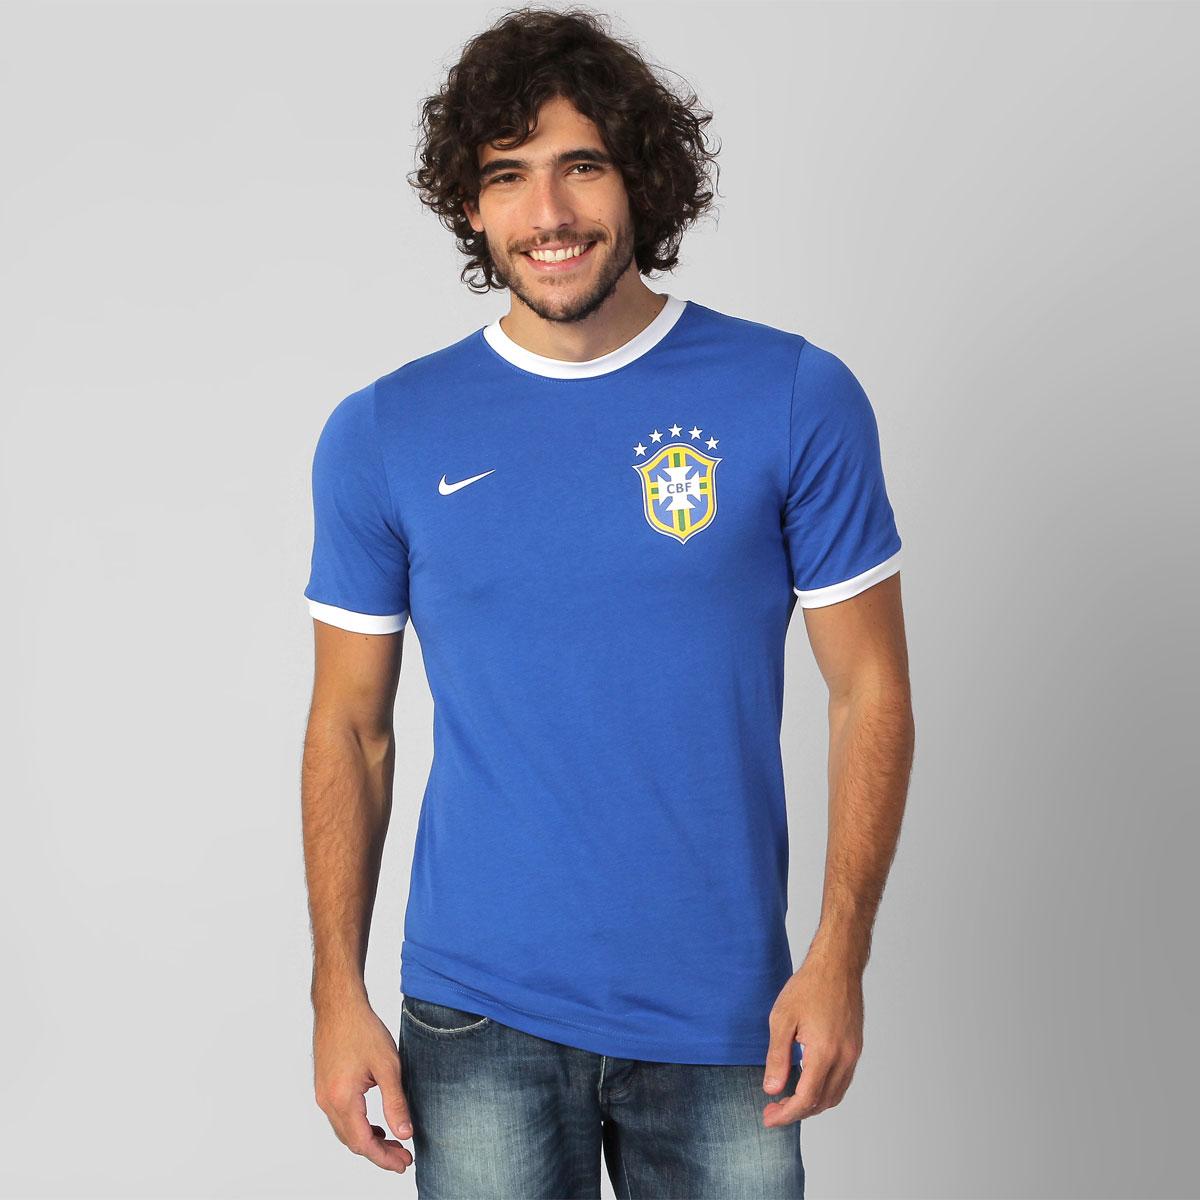 Amiseta Nike Selecao Brasil 2014